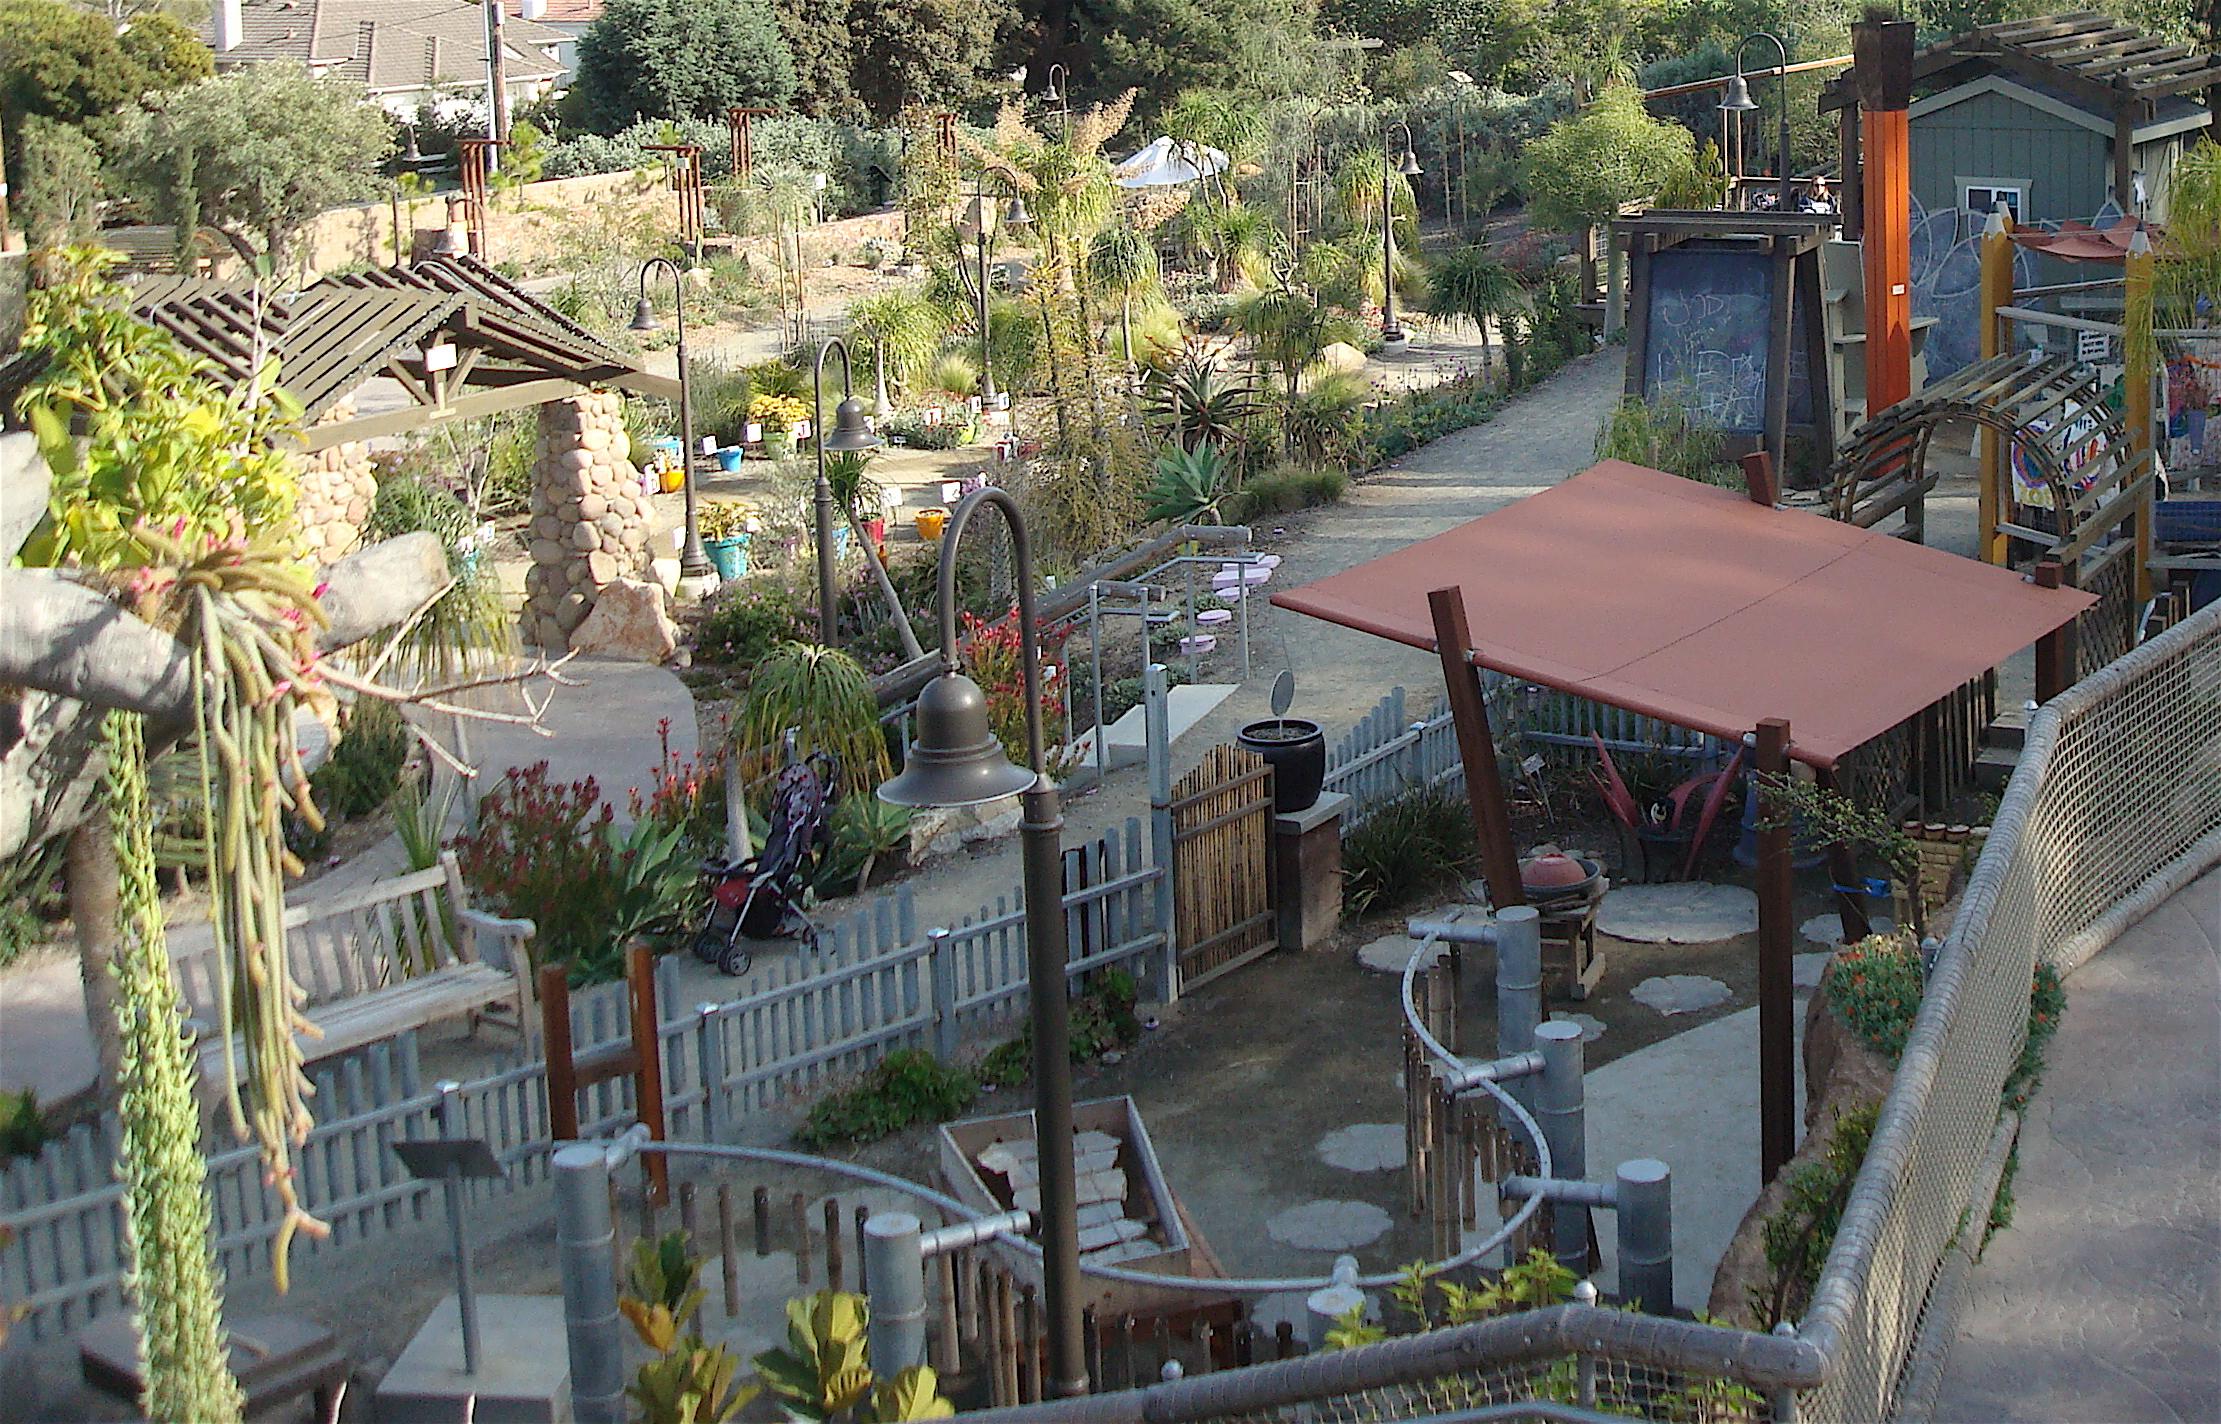 hamilton children s garden city sights for kidsâ